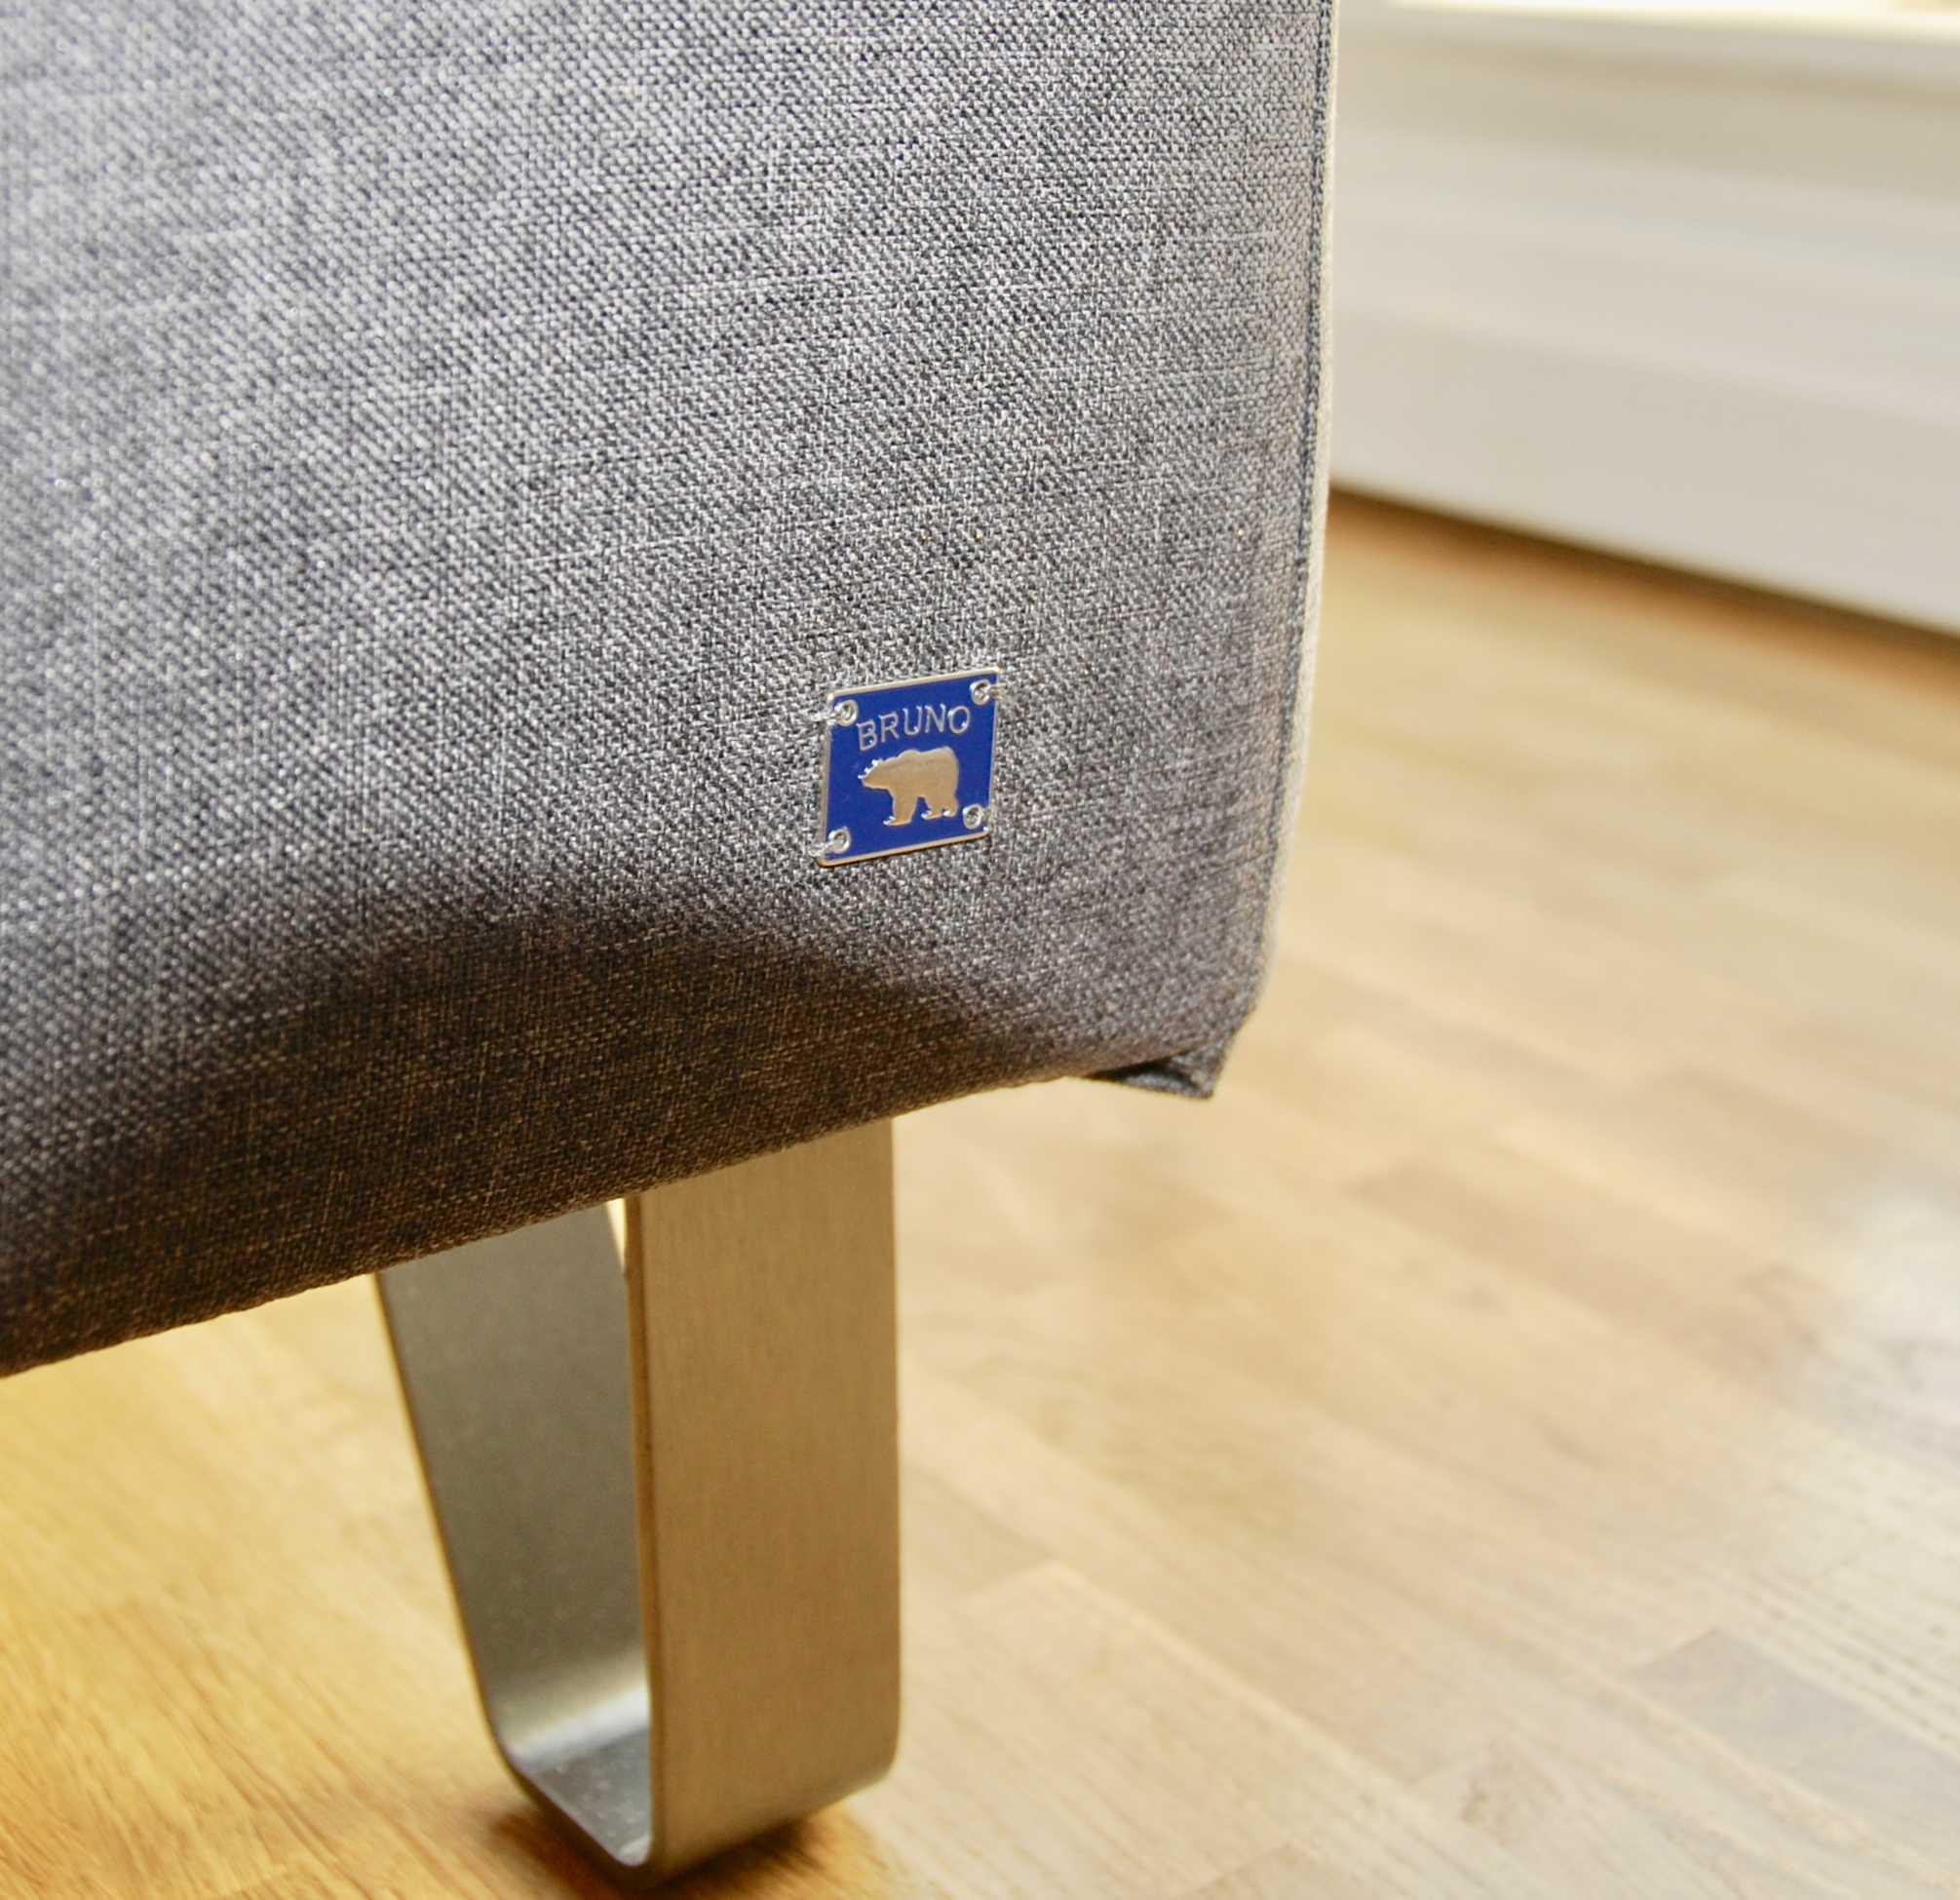 norderneyer sonnendecks wohnung 11 in norderney niedersachsen andrea knost. Black Bedroom Furniture Sets. Home Design Ideas